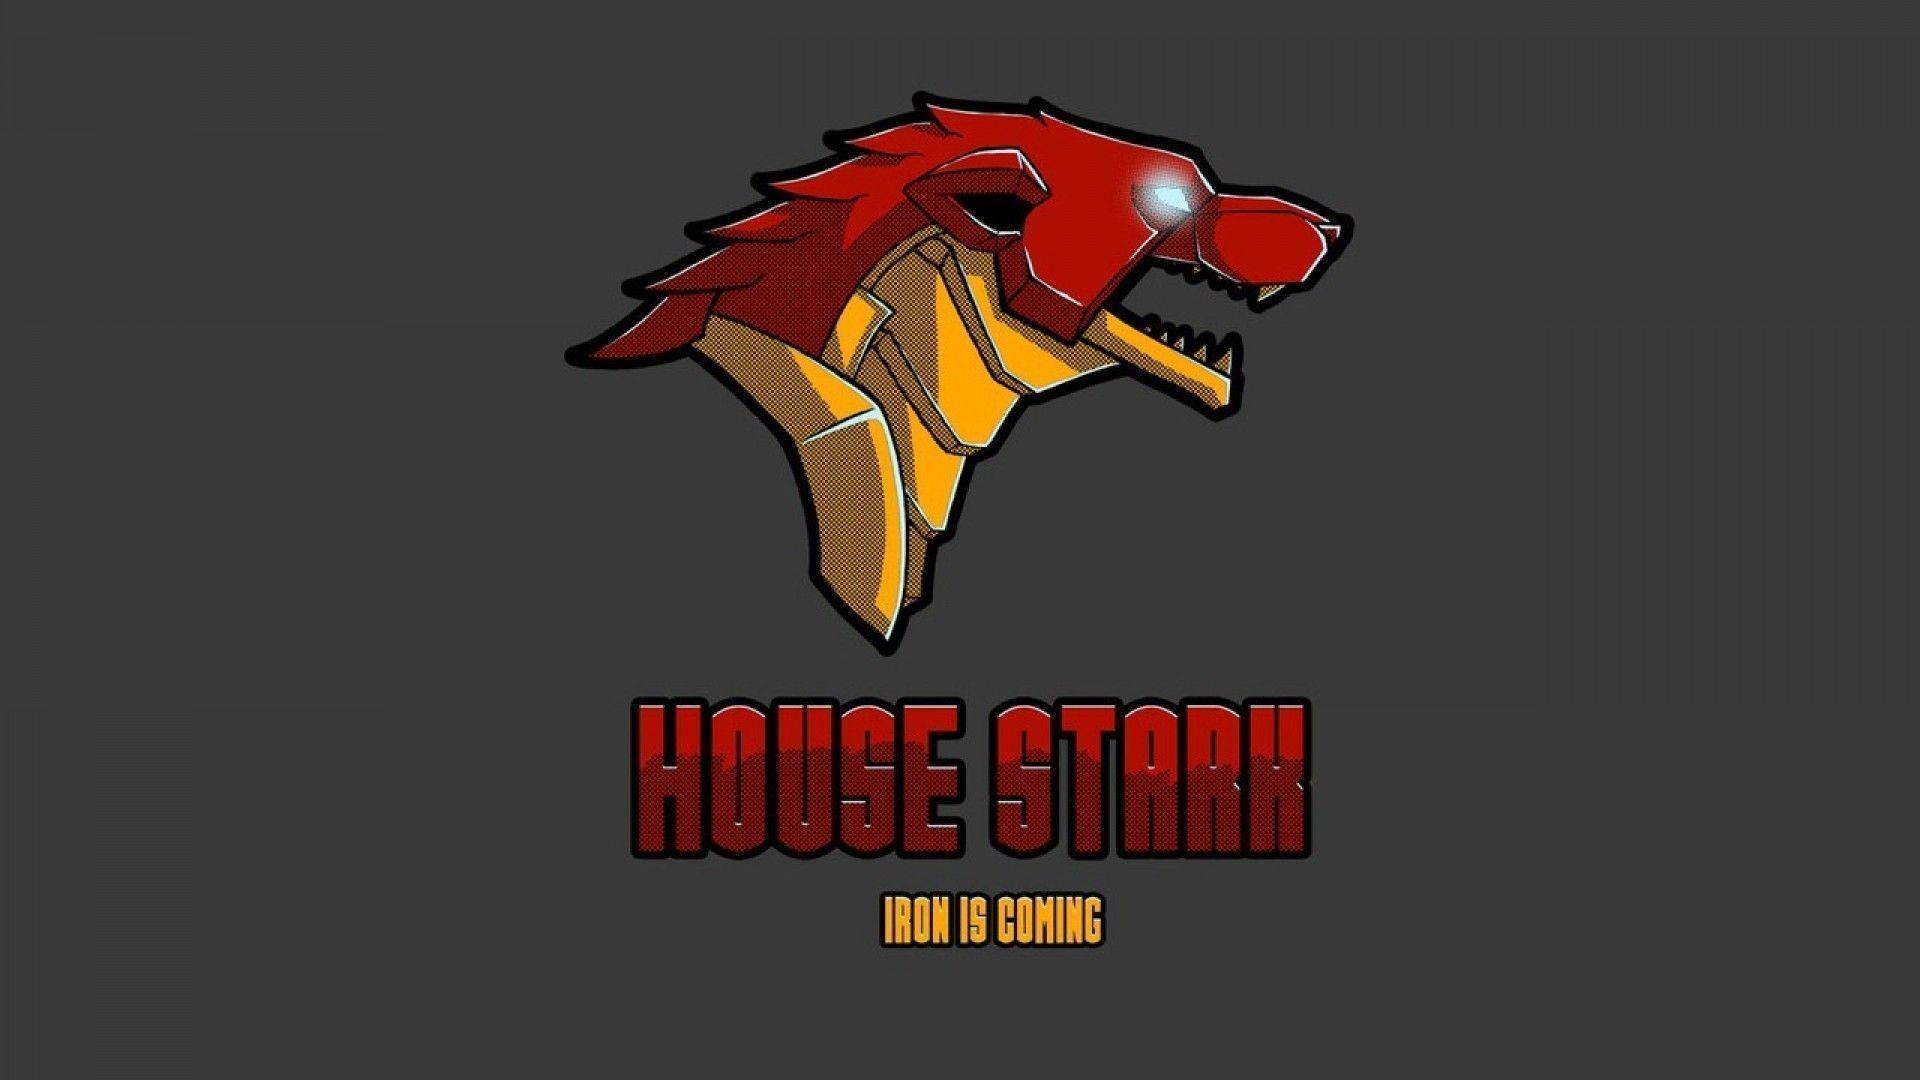 Game Of Thrones House Stark, got, tv-shows, HD Wallpaper .